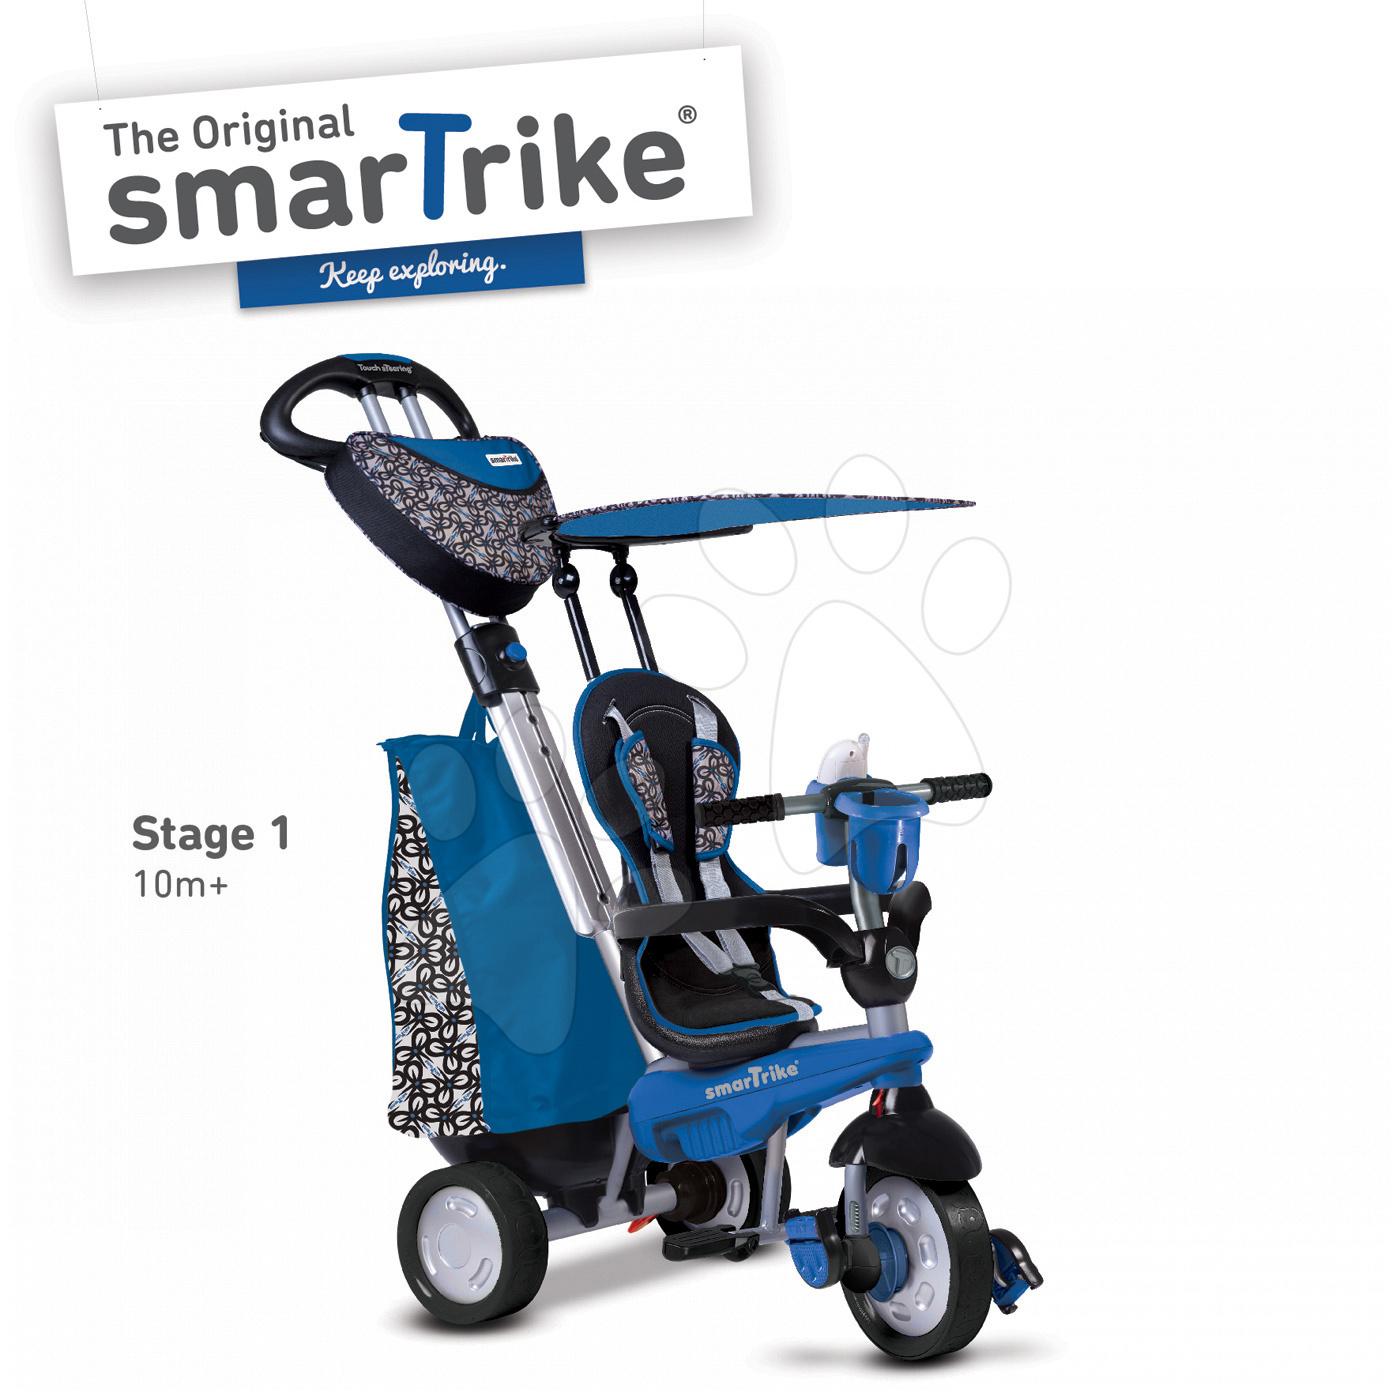 Trojkolka Dream Legend Touch Steering 4v1 smarTrike s 2 taškami modro-čierna od 10 mes